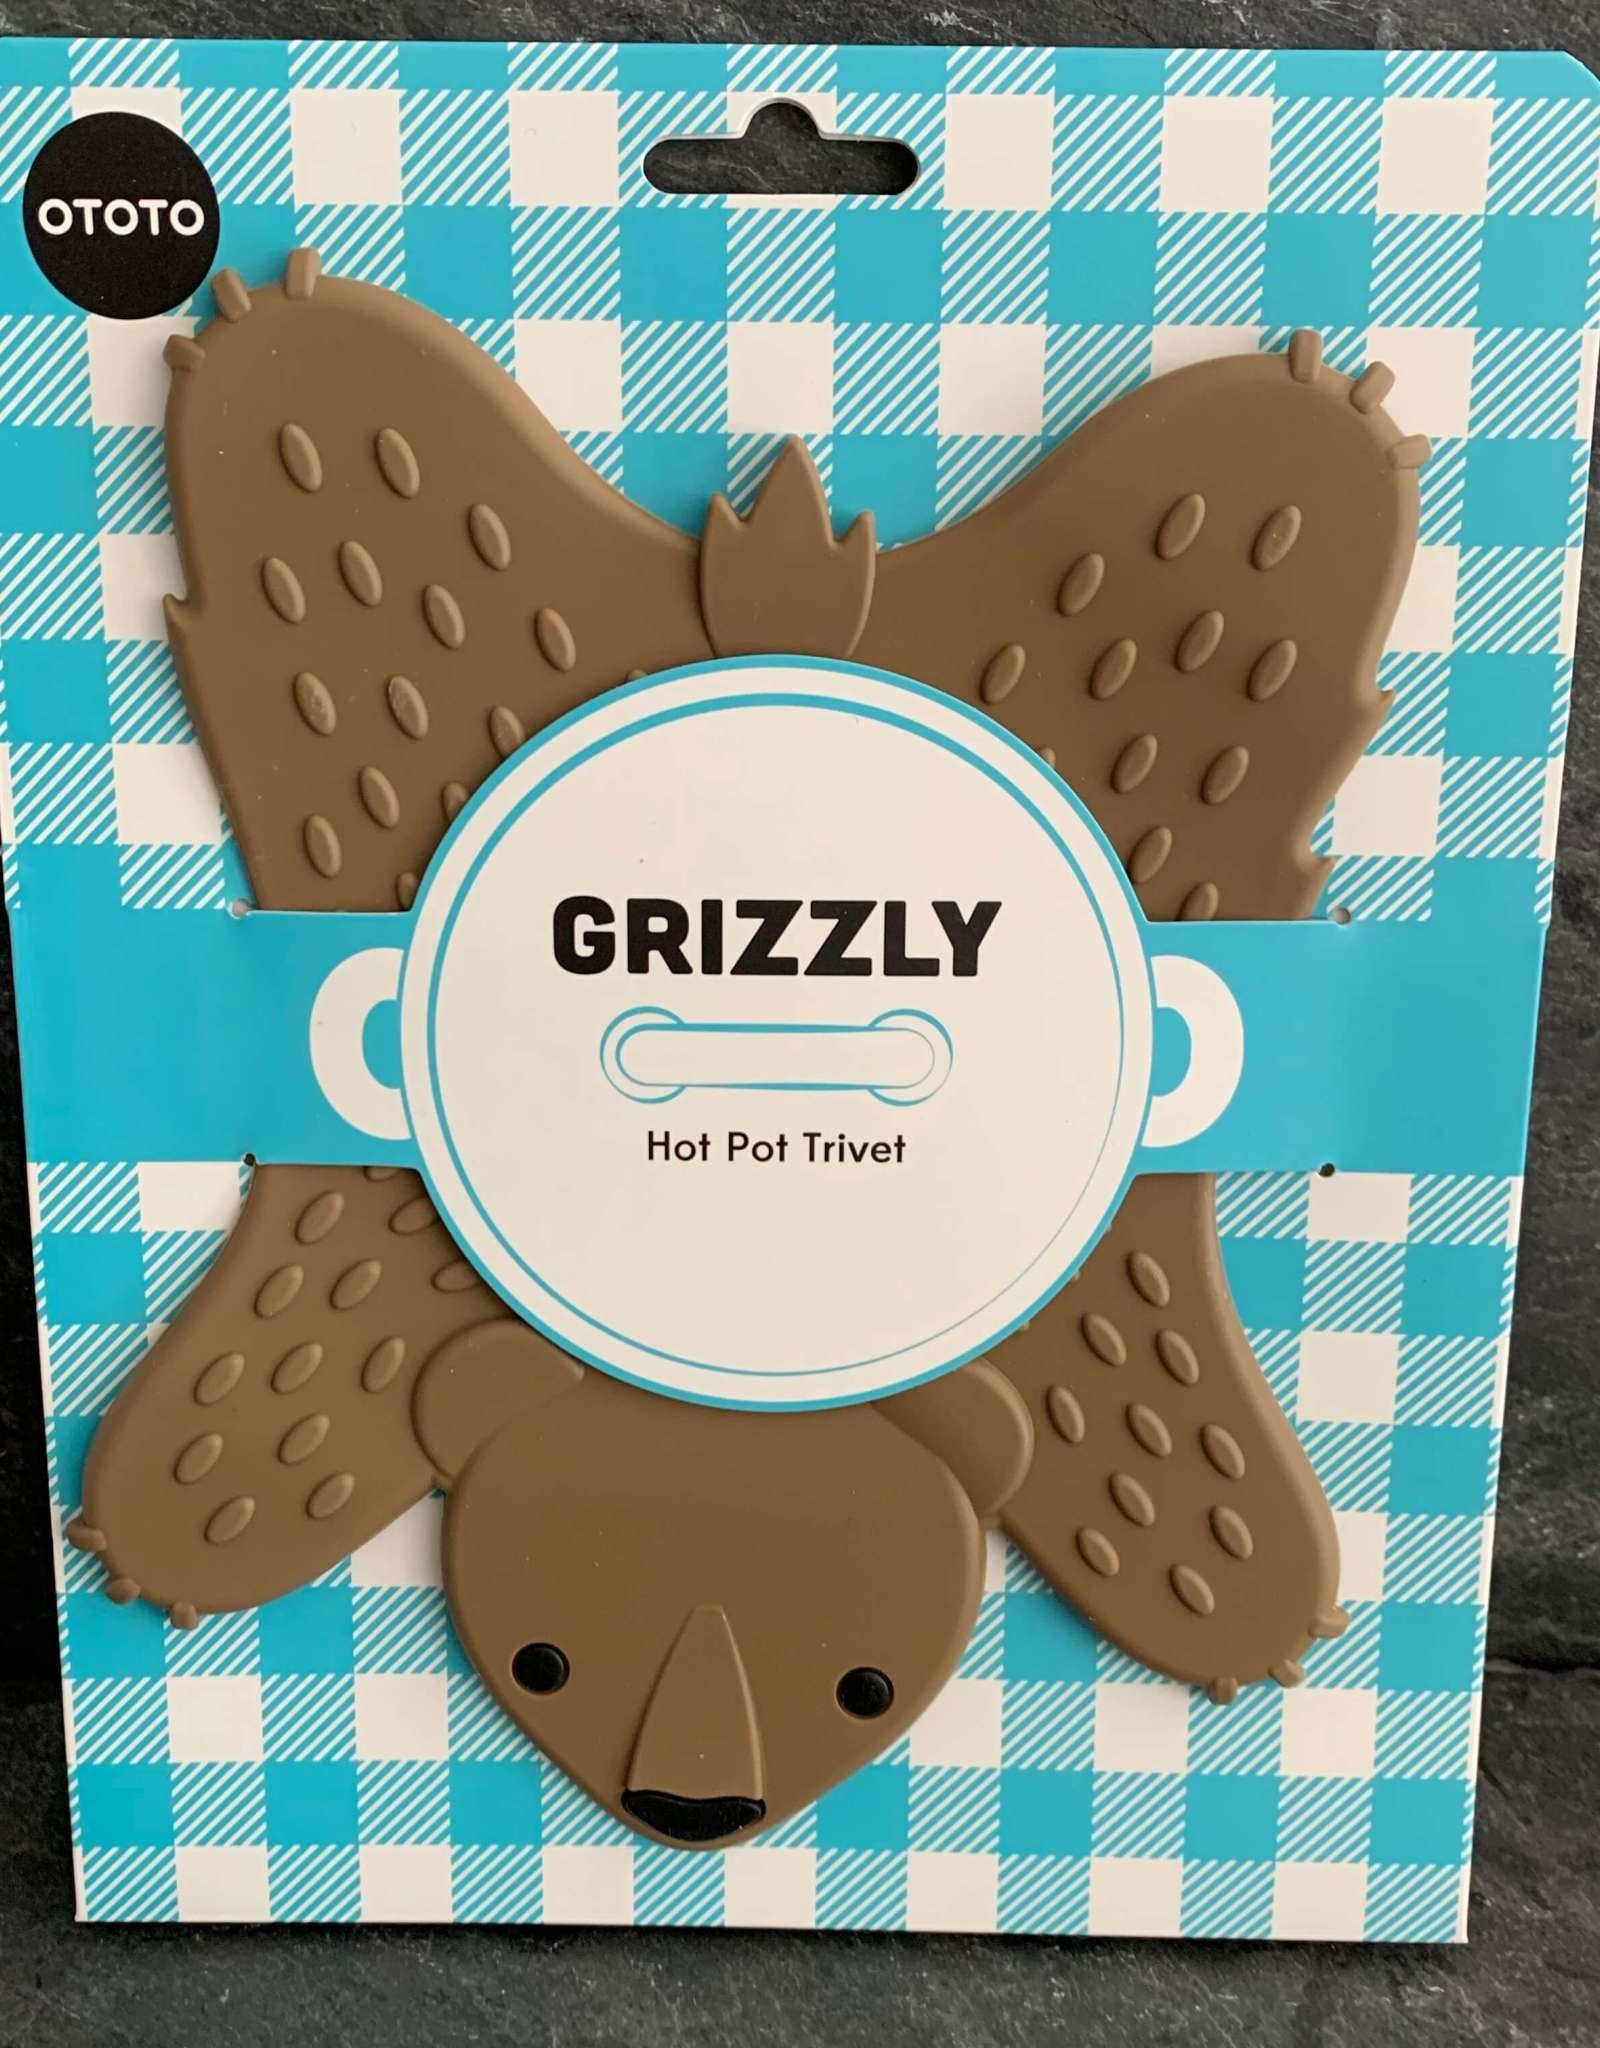 OTOTO OTOTO Grizzly Hot Pot Trivit